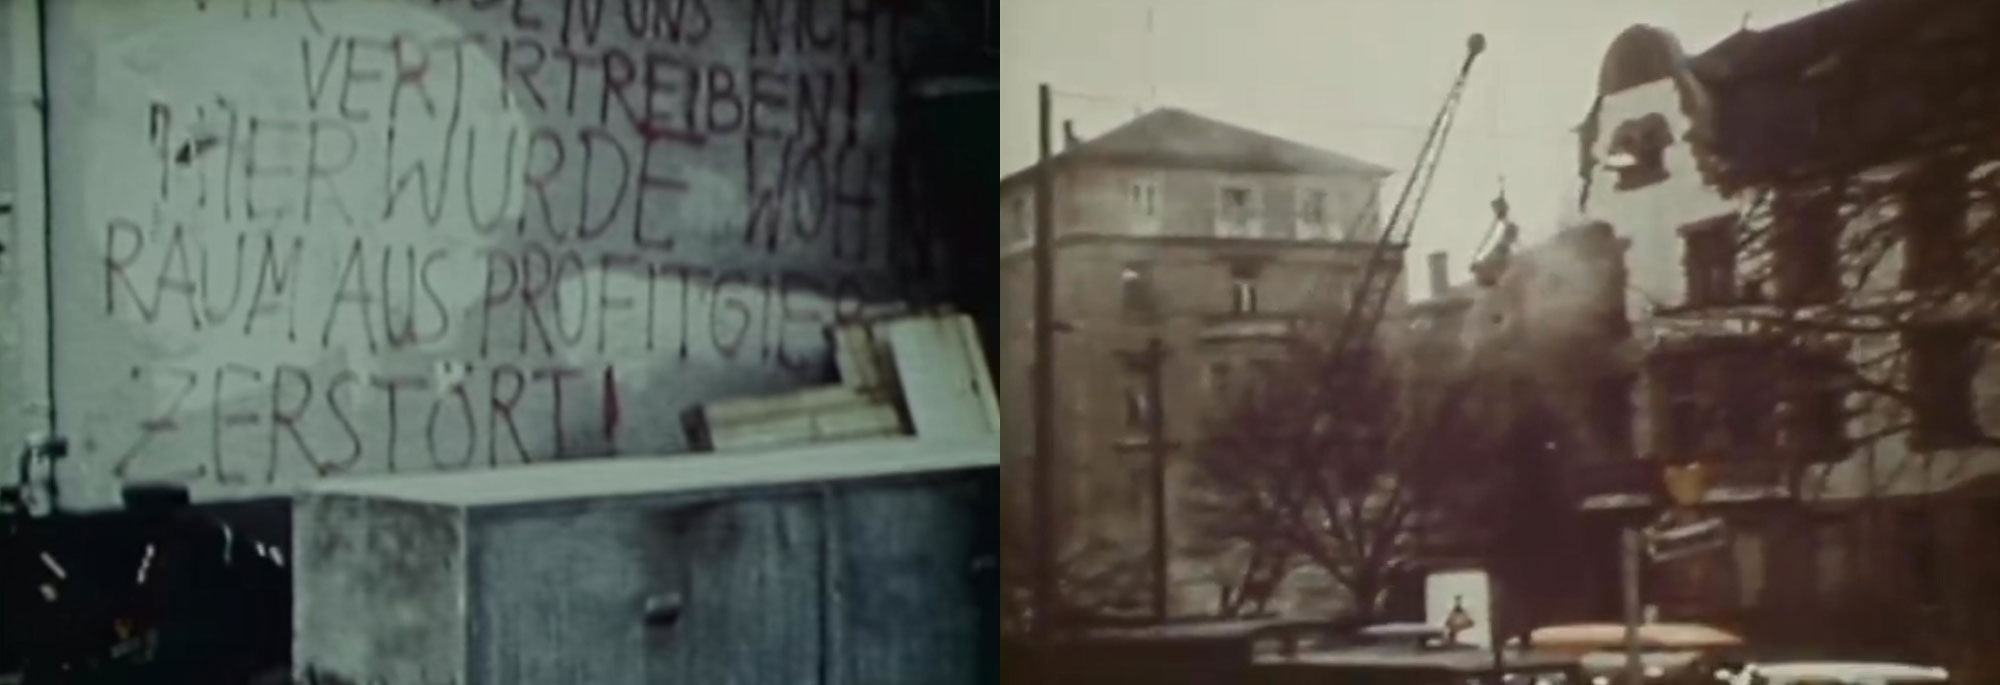 Was war der Frankfurter Häuserkampf?